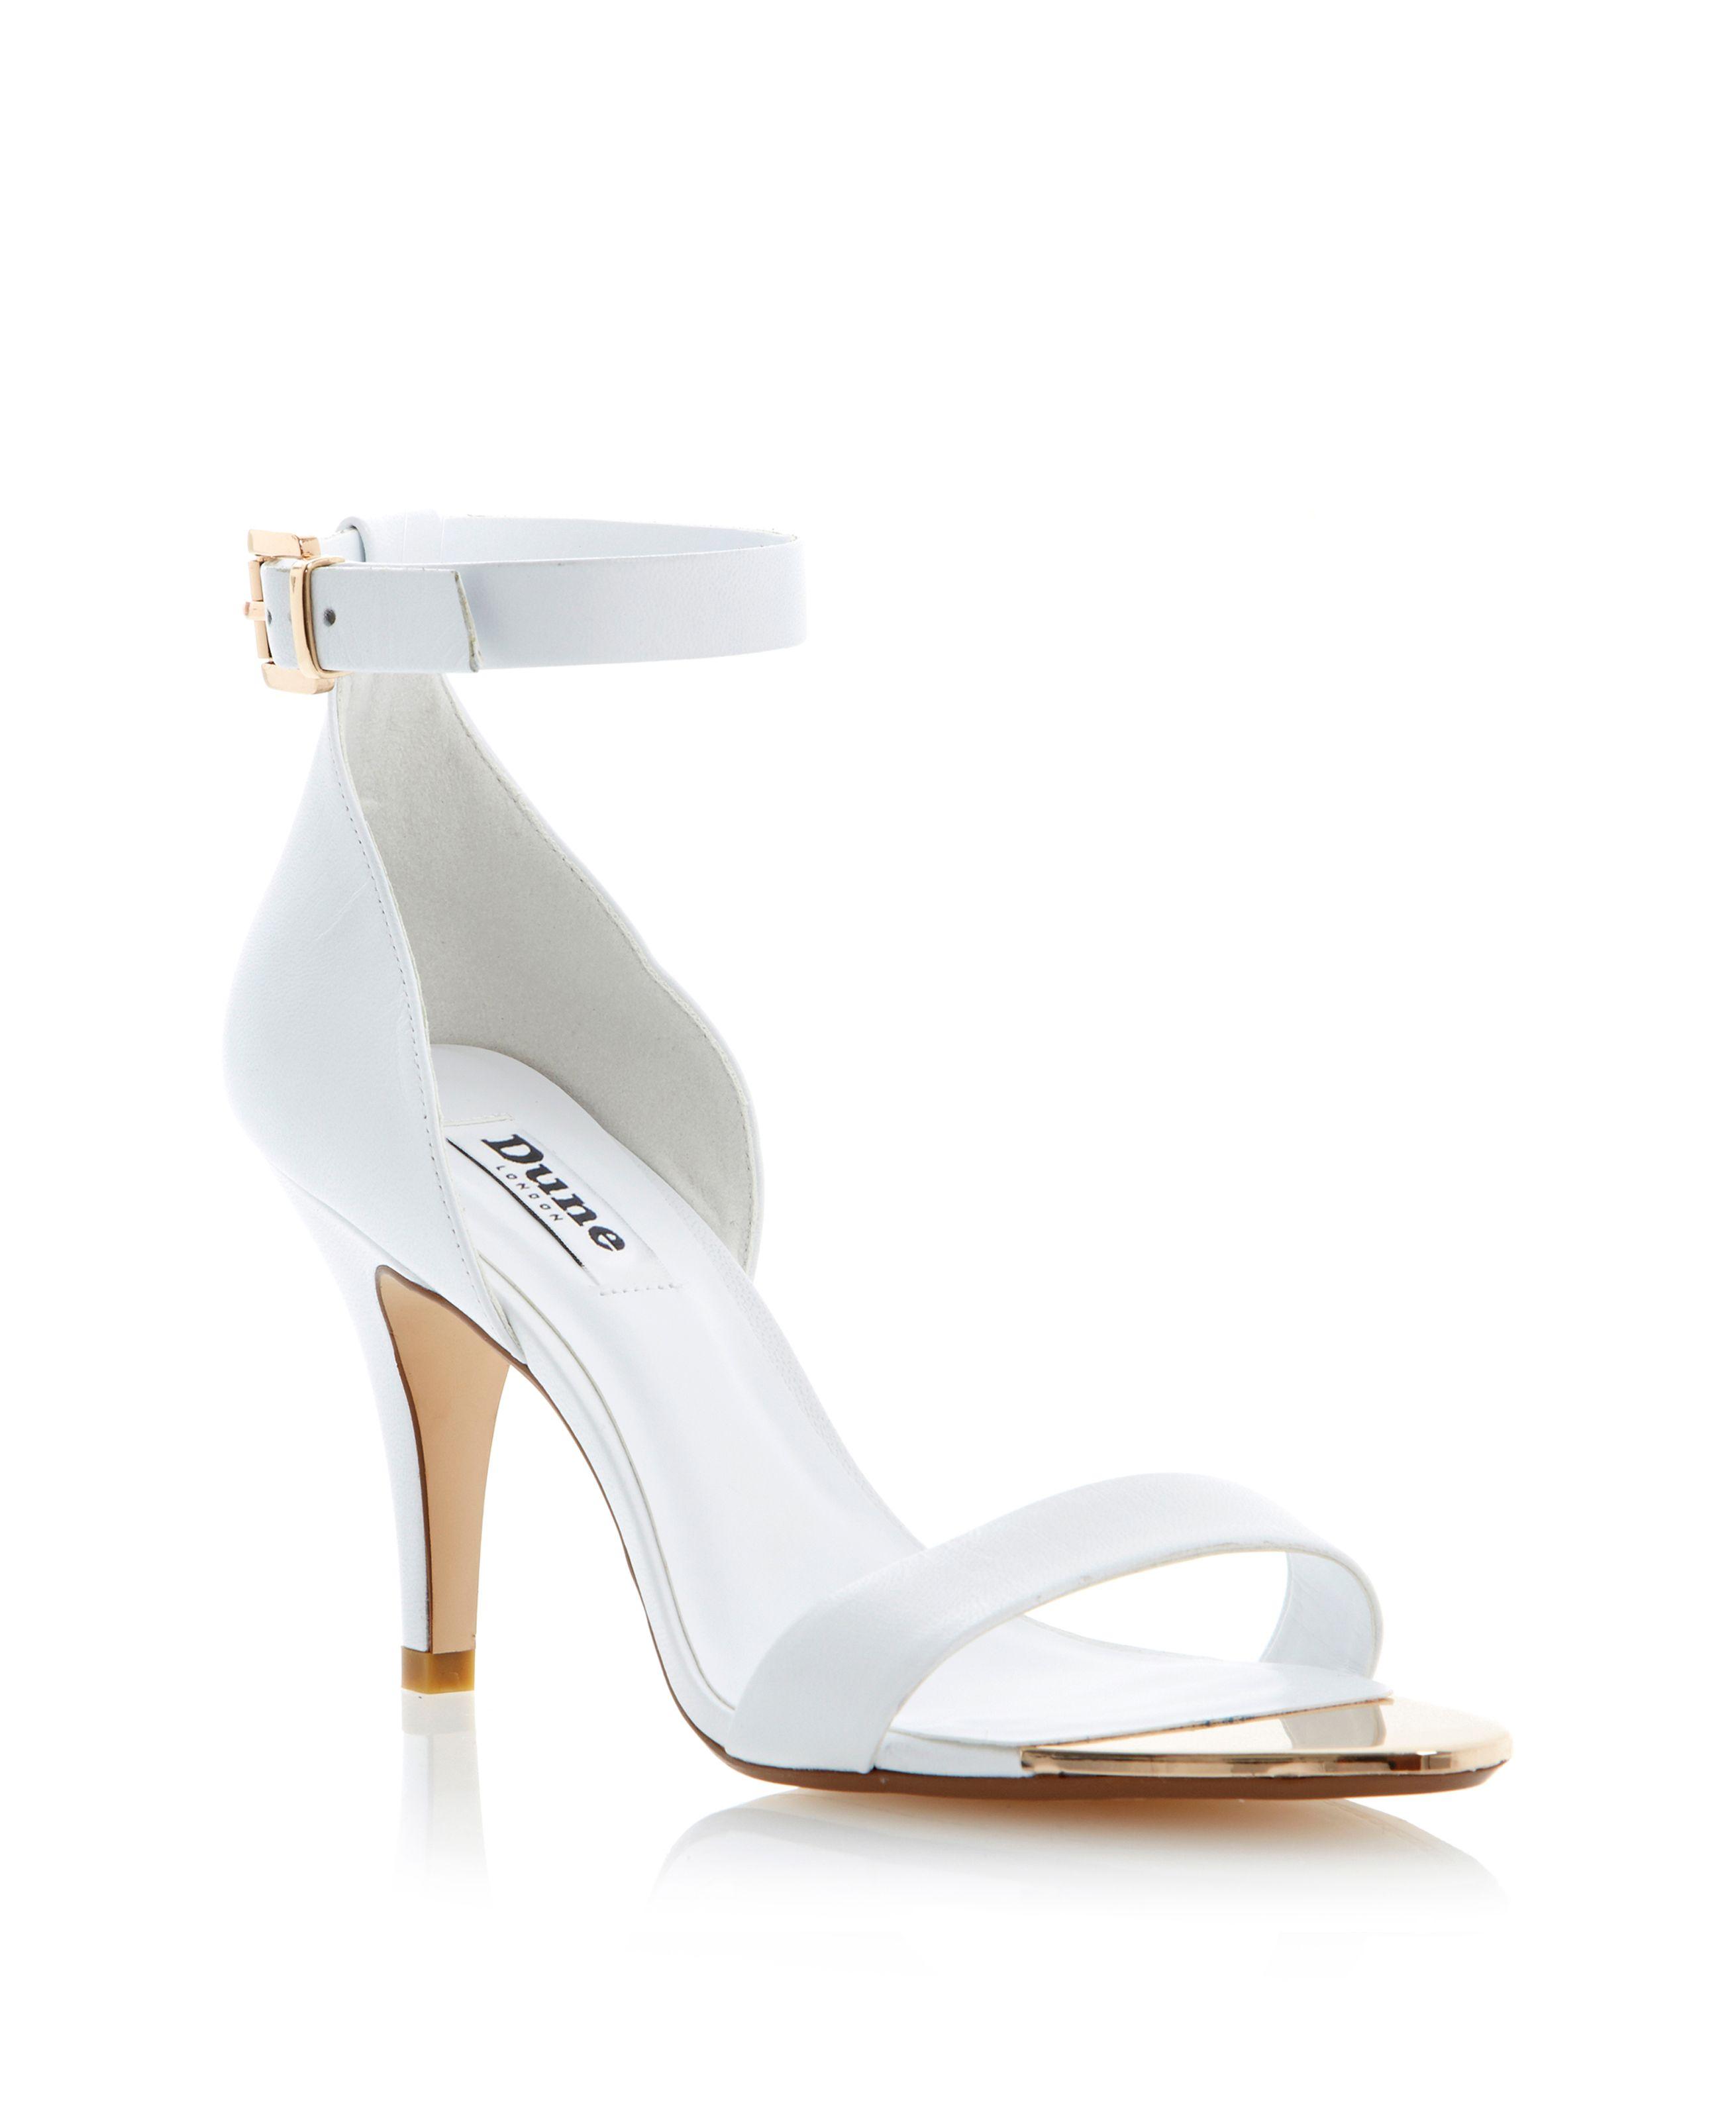 White Sandals Shoes Hose Of Fraser